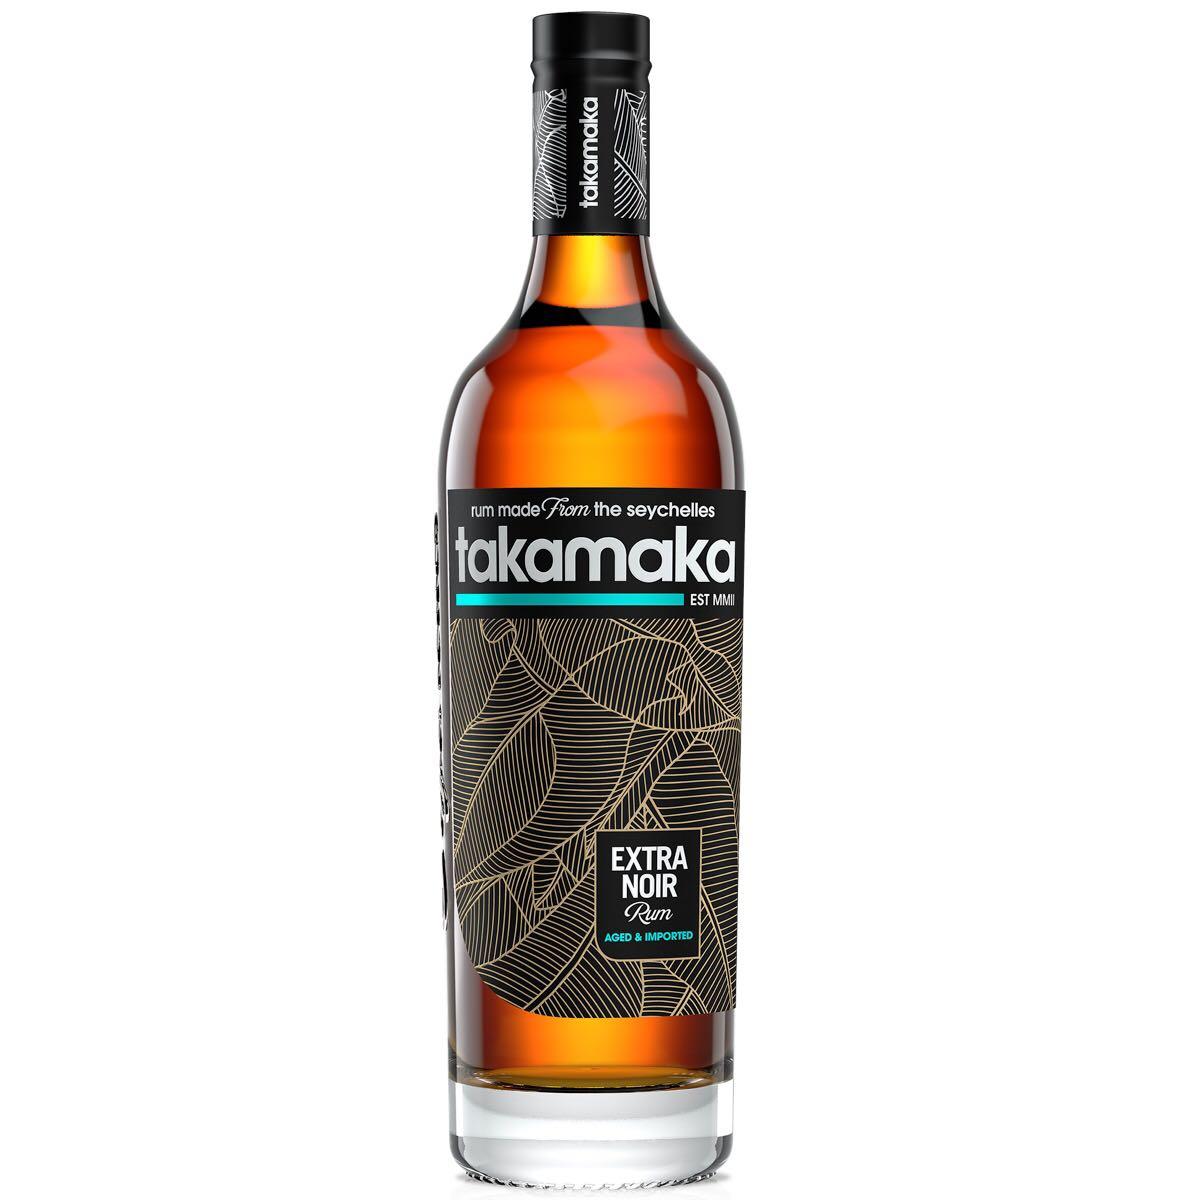 Bottle image of Takamaka Extra Noir Rum